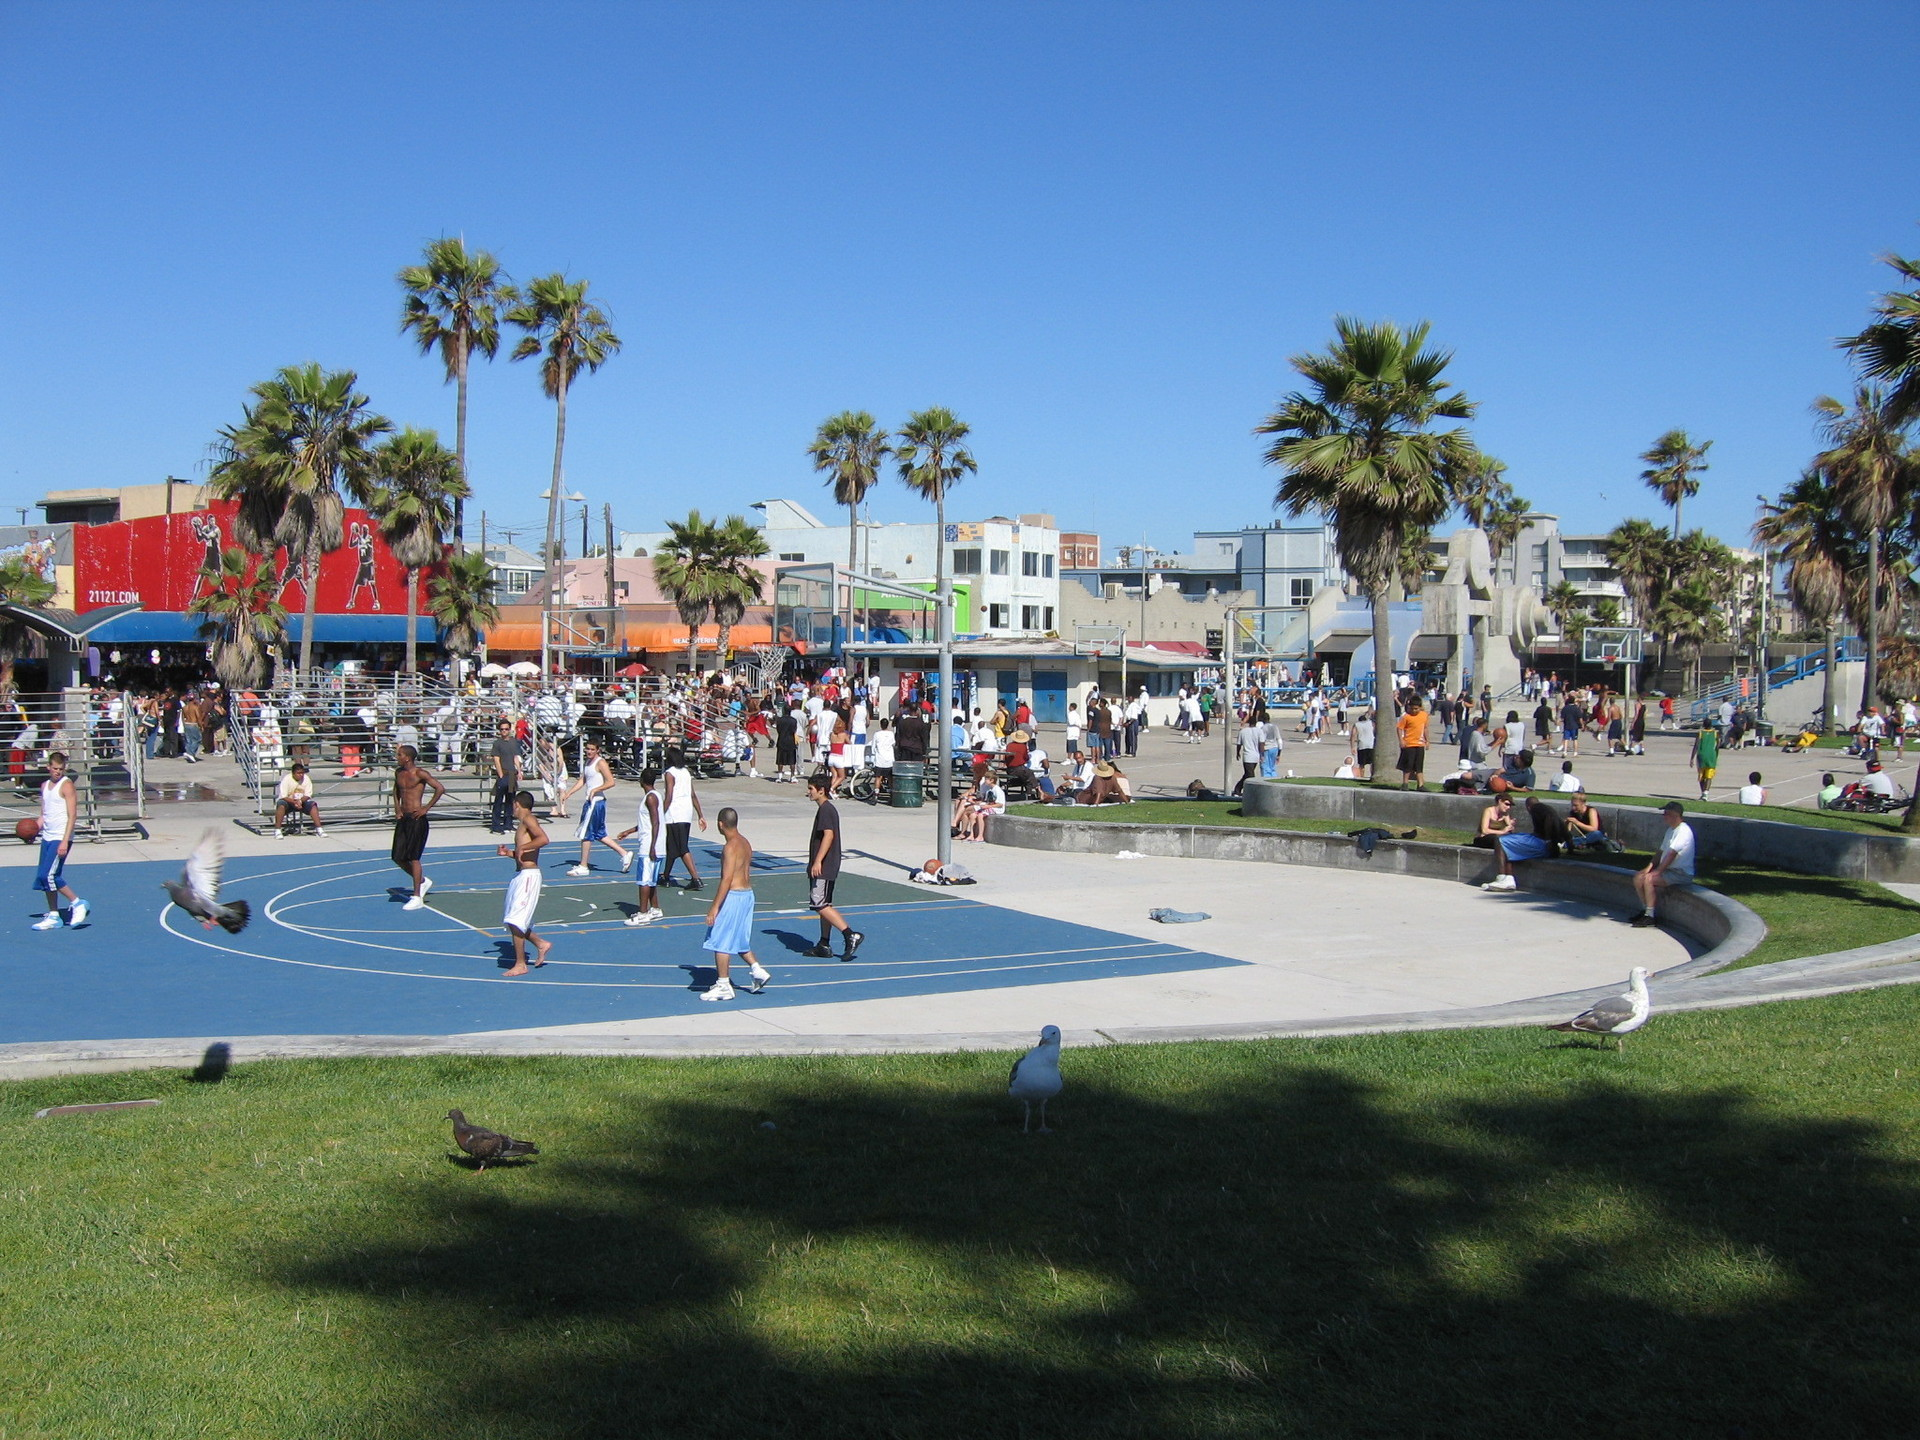 Los Angeles images Venice Beach wallpaper photos 1105928 1920x1440